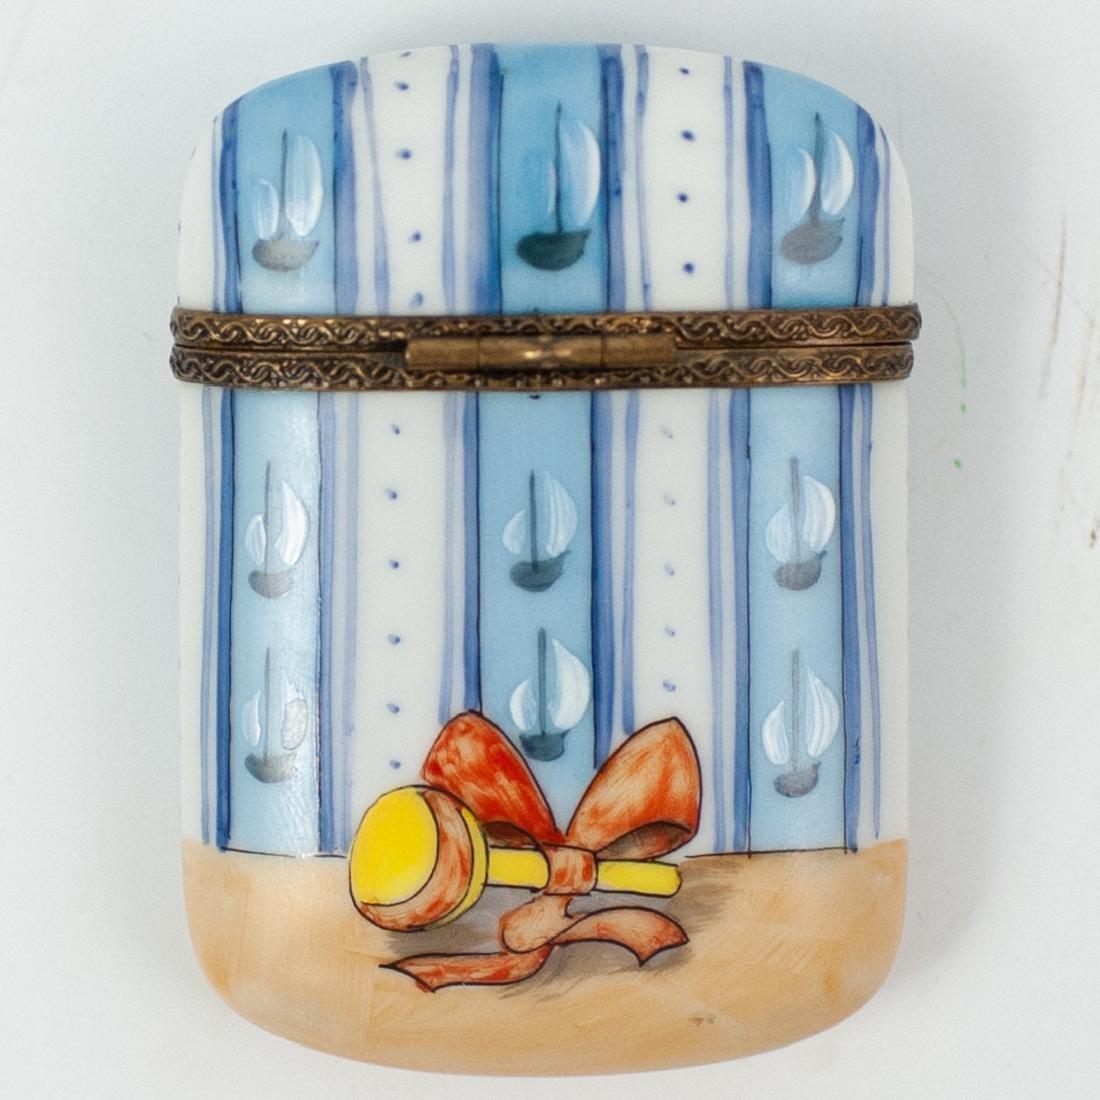 Limoges Porcelain Teddy Bear Pill Box - 2